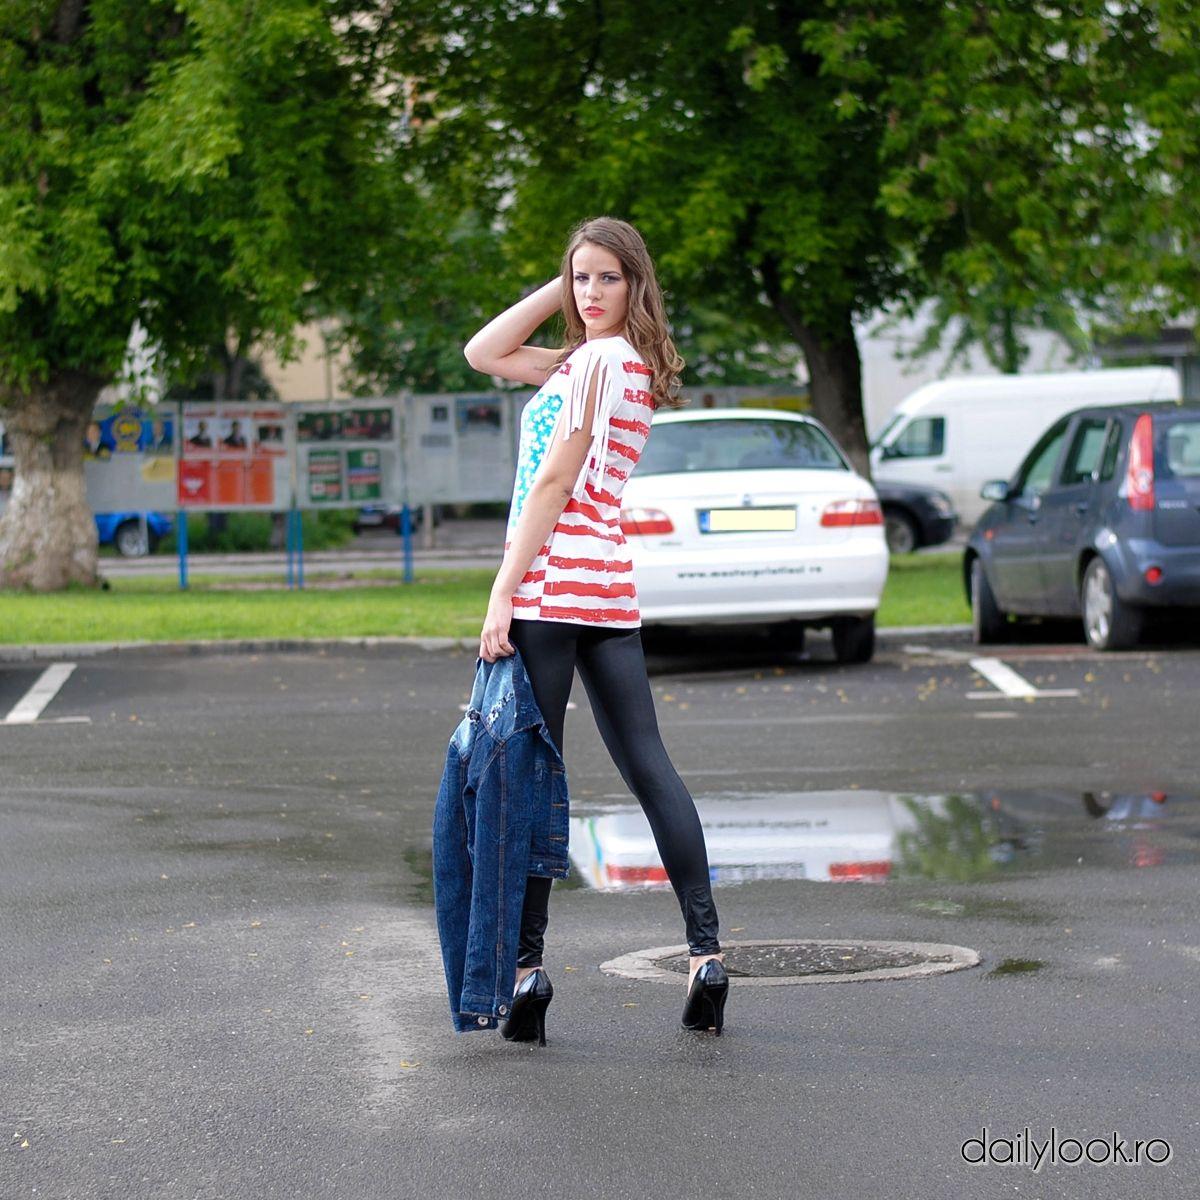 Tricou Steag SUA   Pret Produs: 62 RON/ pret redus: 52 ron  http://www.dailylook.ro/produs.php?id=1139